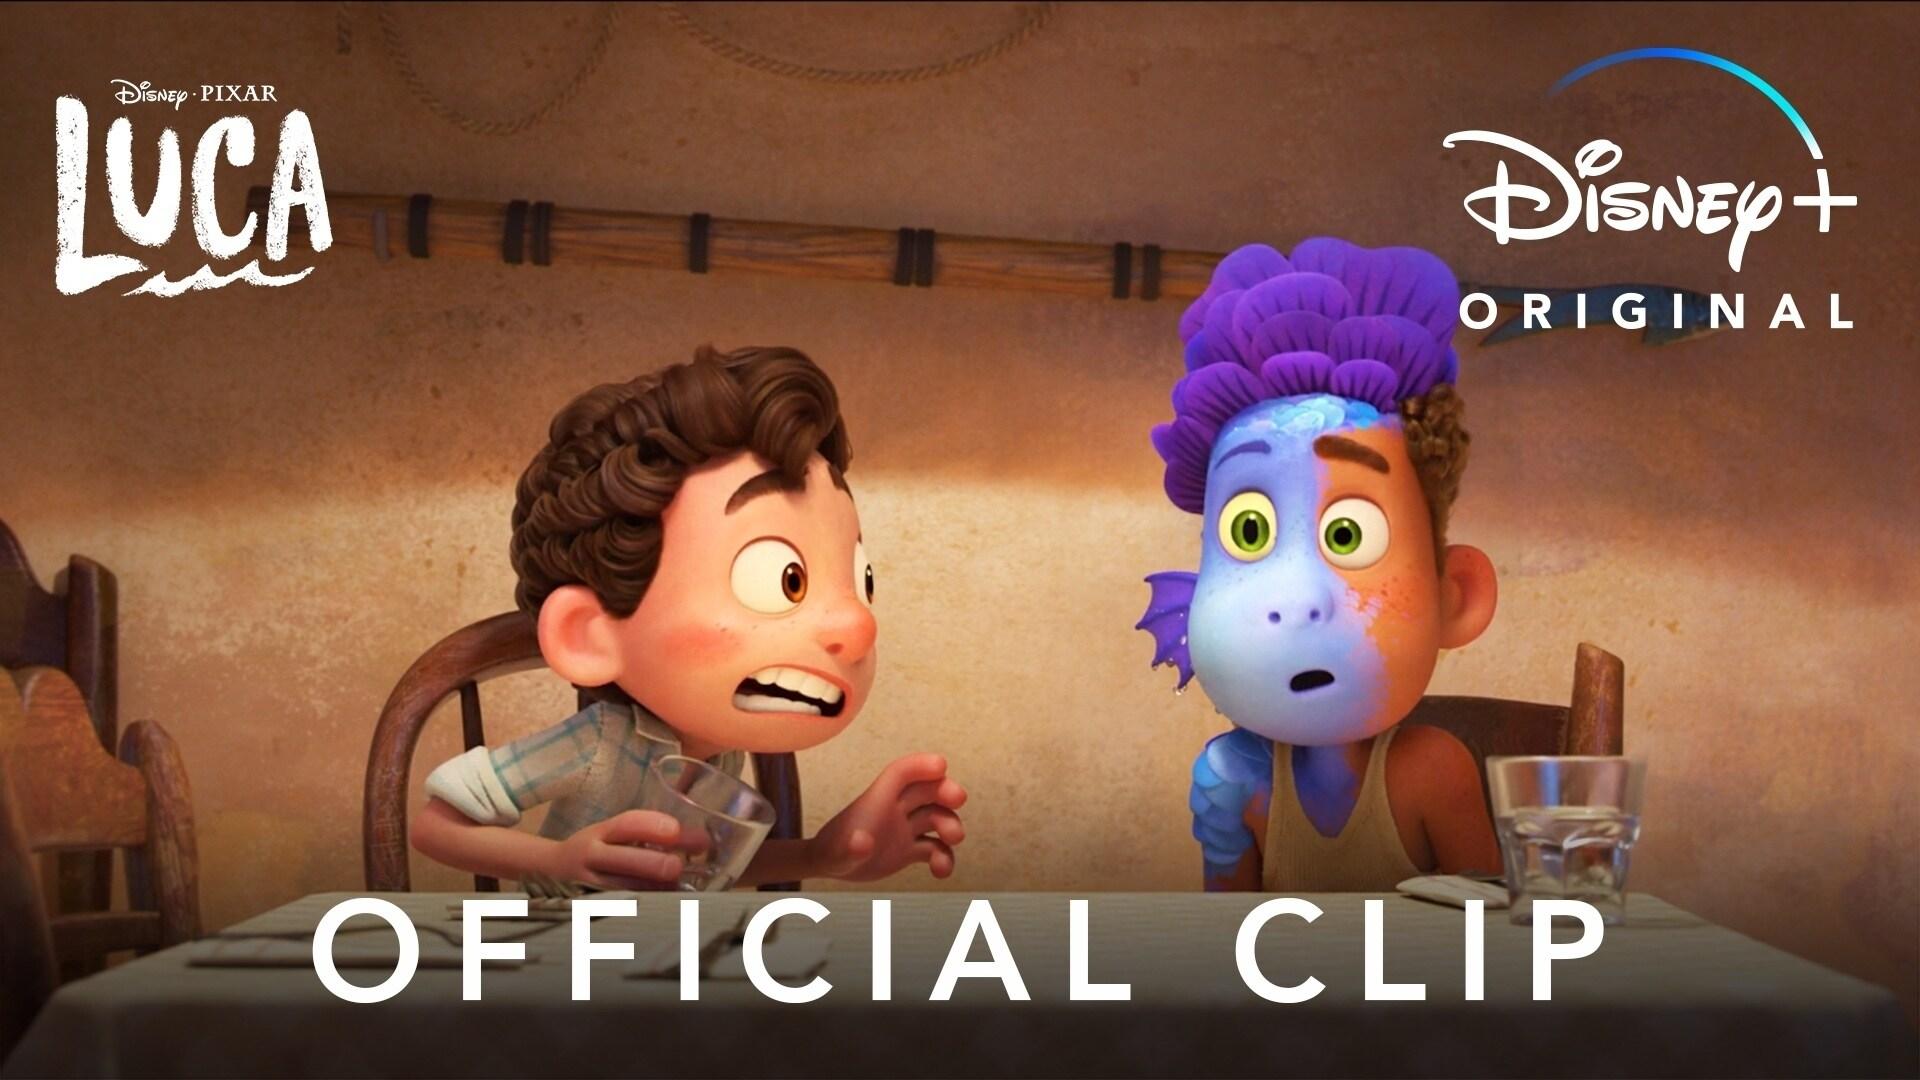 Sea Monsters | Disney and Pixar's Luca | Disney+